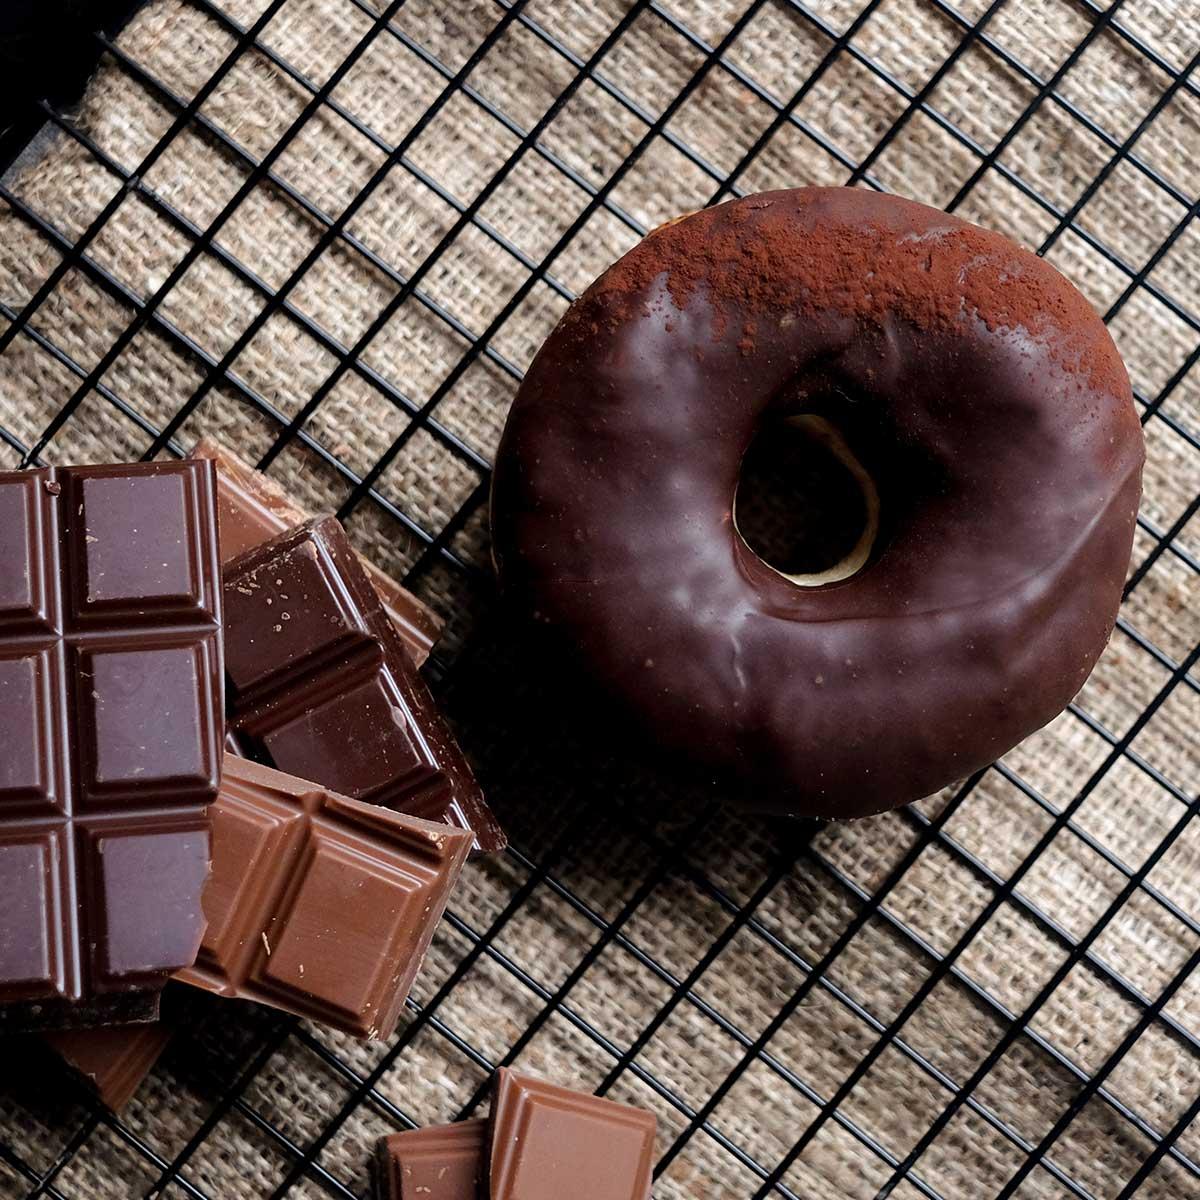 Doughnuts_ChocTruffle_01